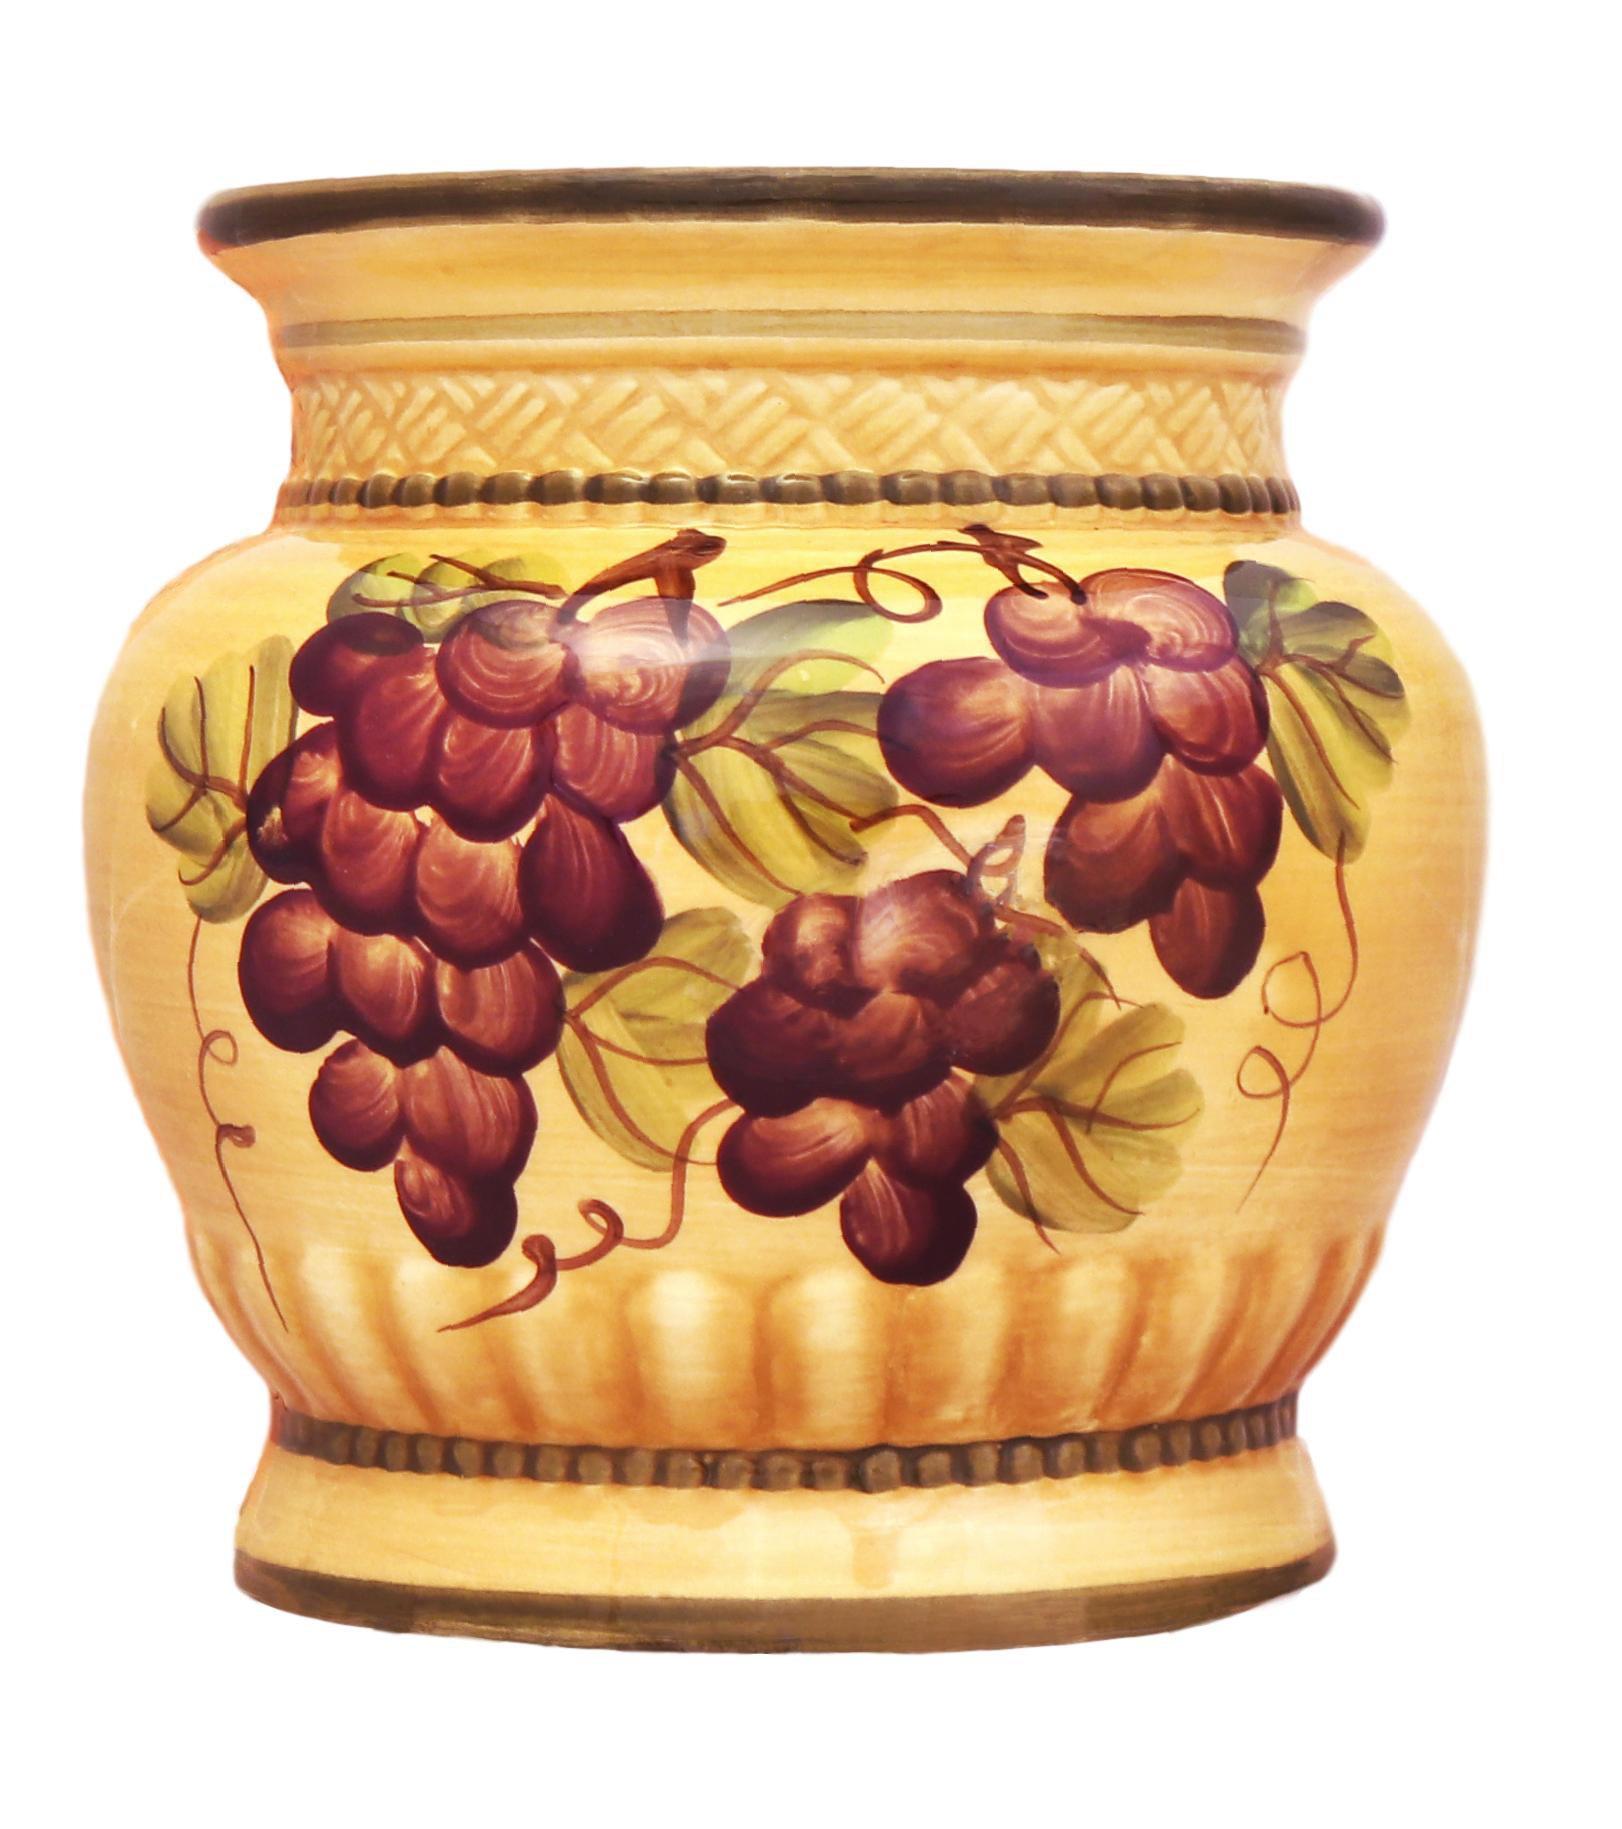 Sonoma Grape Pattern Collection, Electric Tart Burner 4-7/8